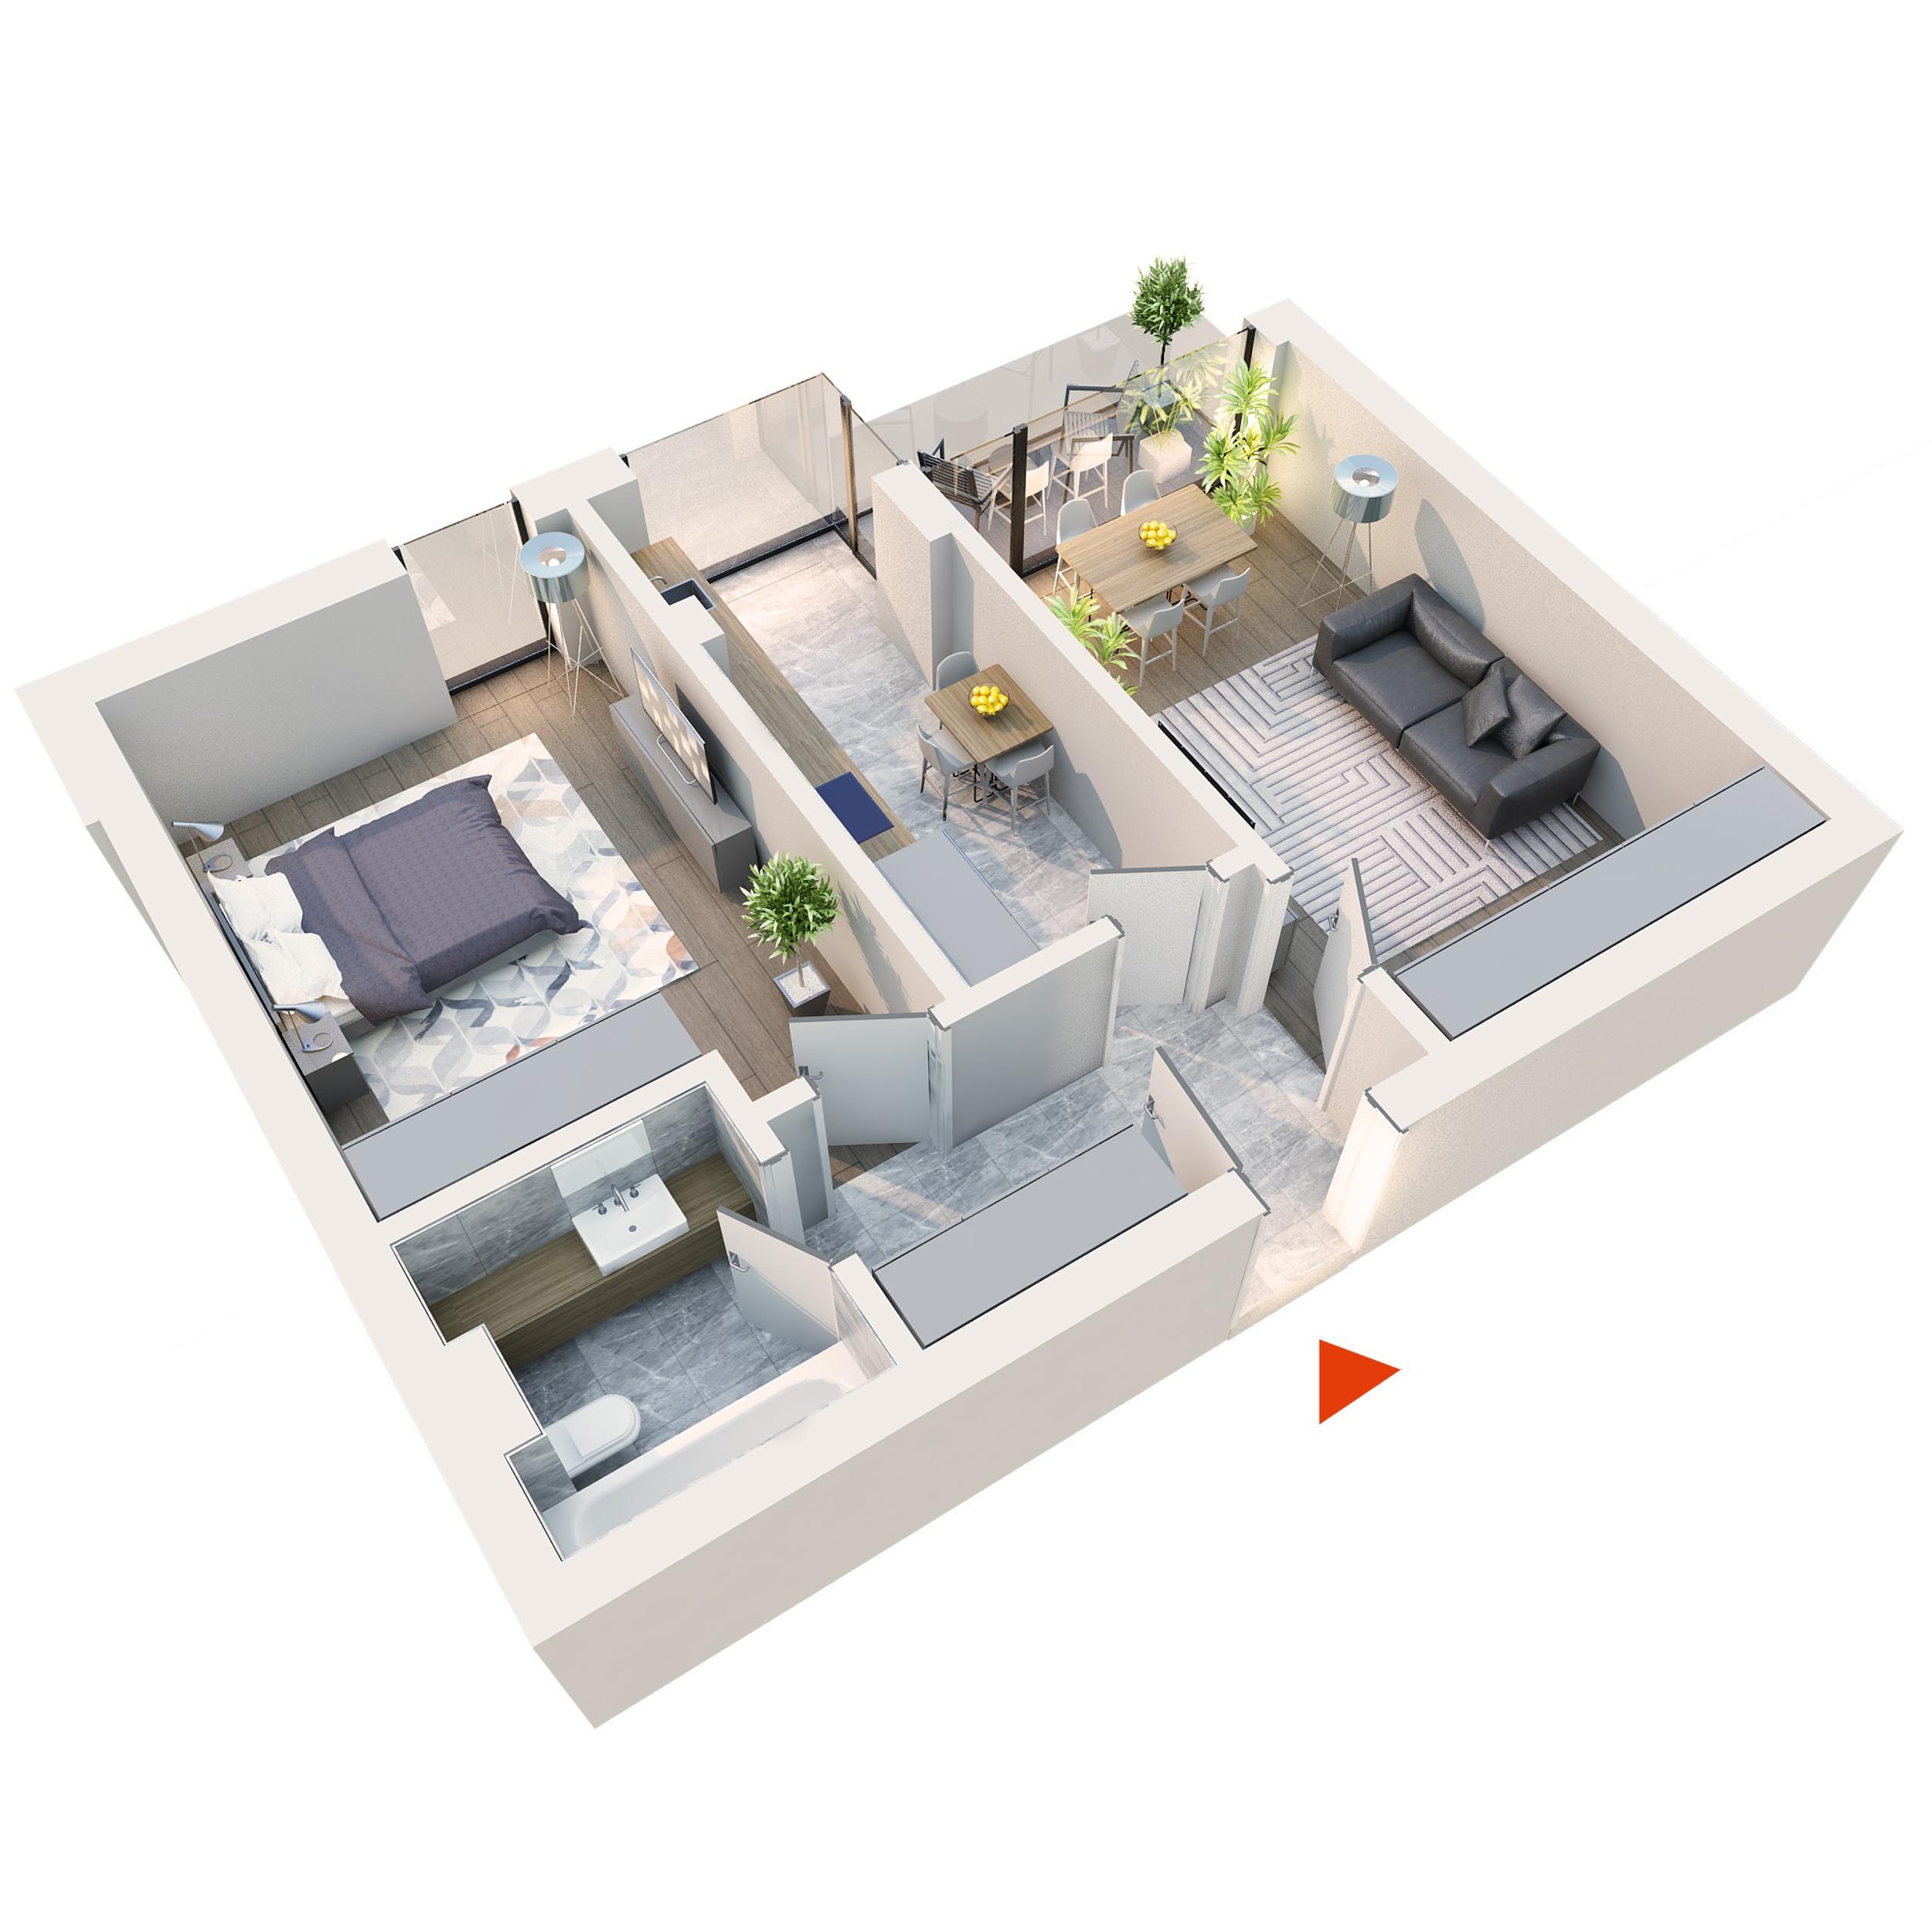 Apartament 2 camere tip 2B1′ balcon | Etaj 1-3 | Corp C3, C4 | Faza 2